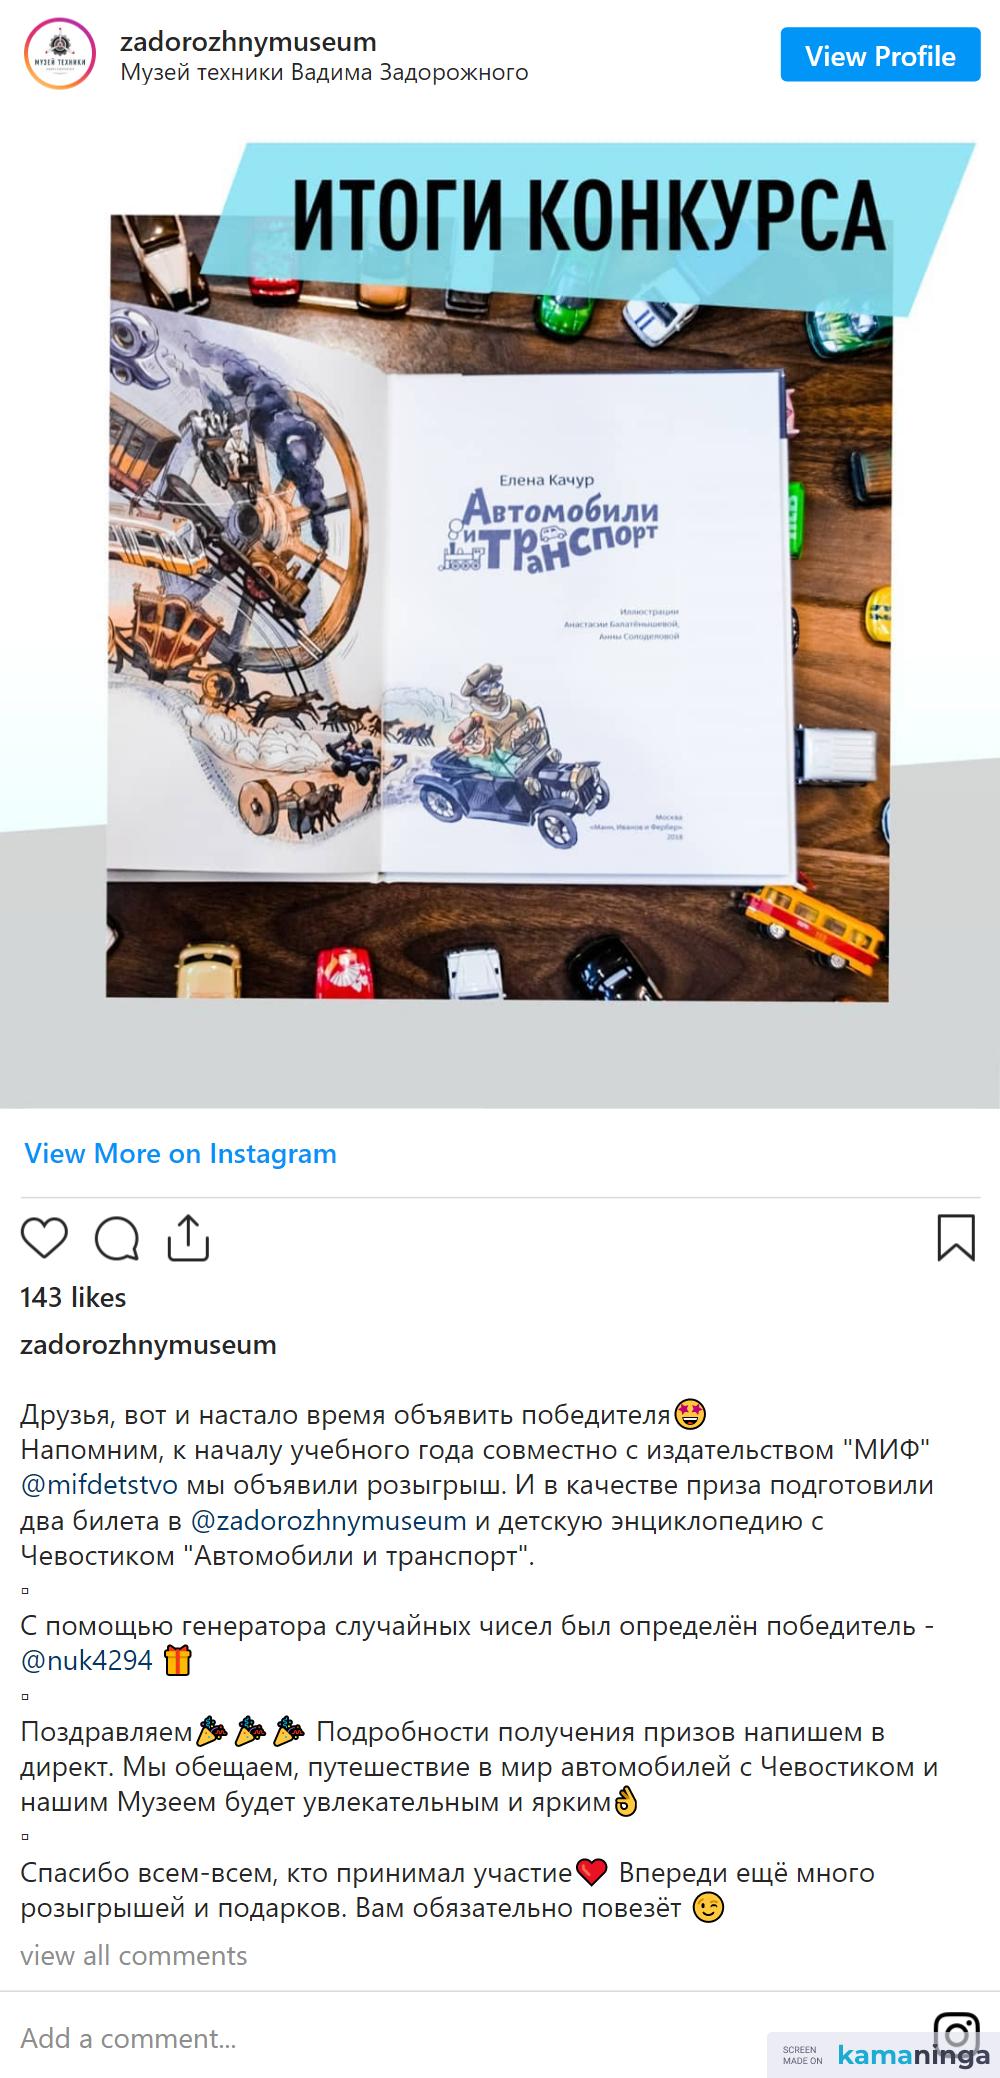 https://www.instagram.com/p/B2Mx0VLBfNb/